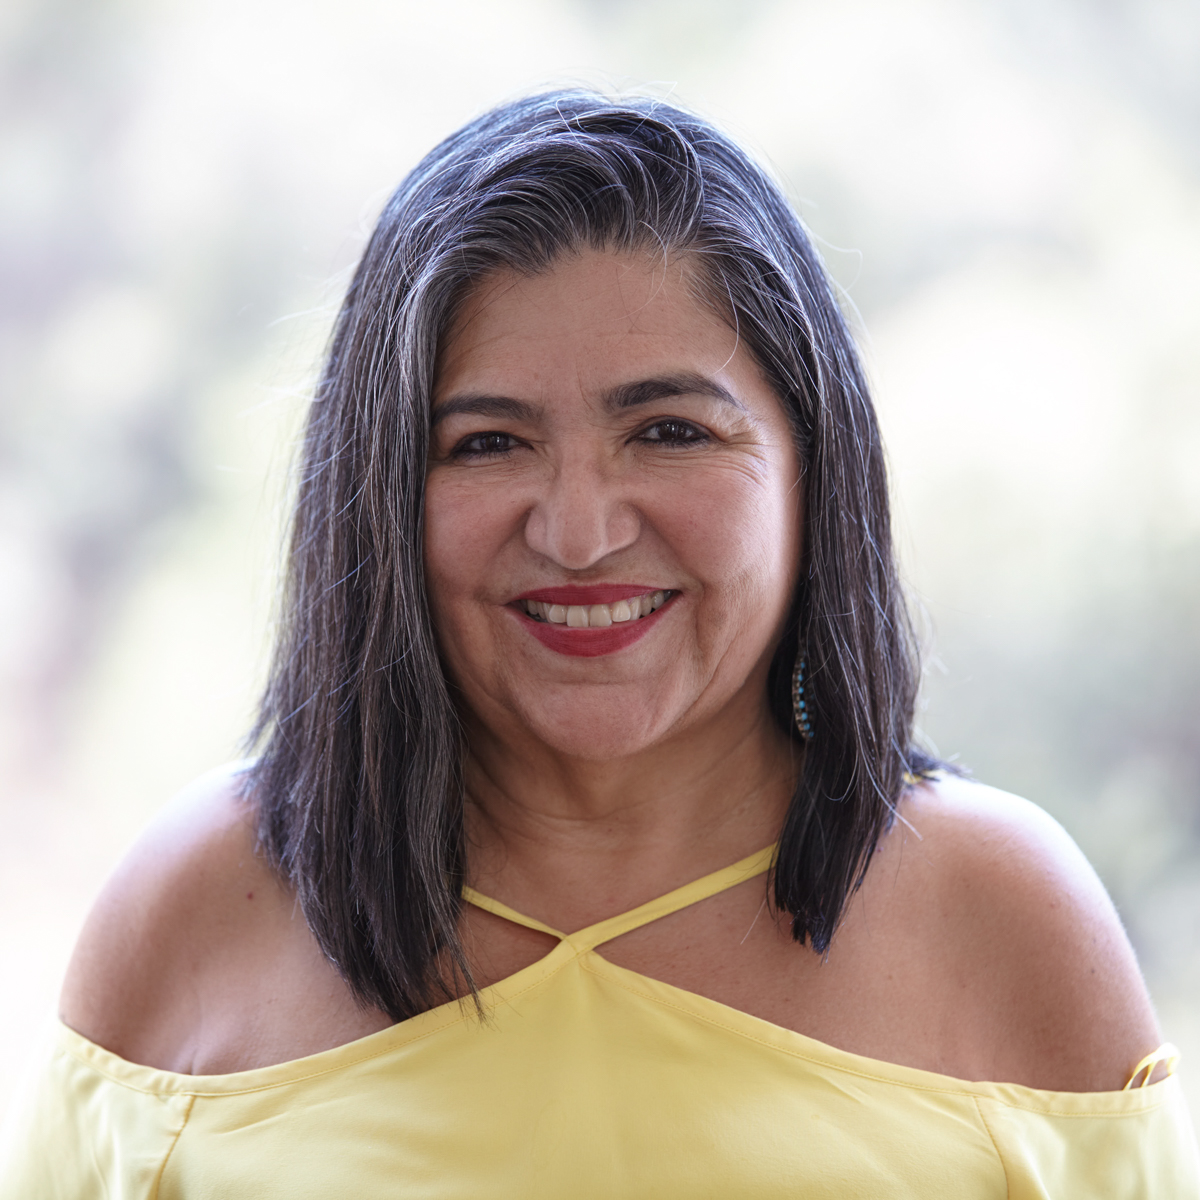 Linda Vallejo. 2018. Photo by Pablo Aguilar.